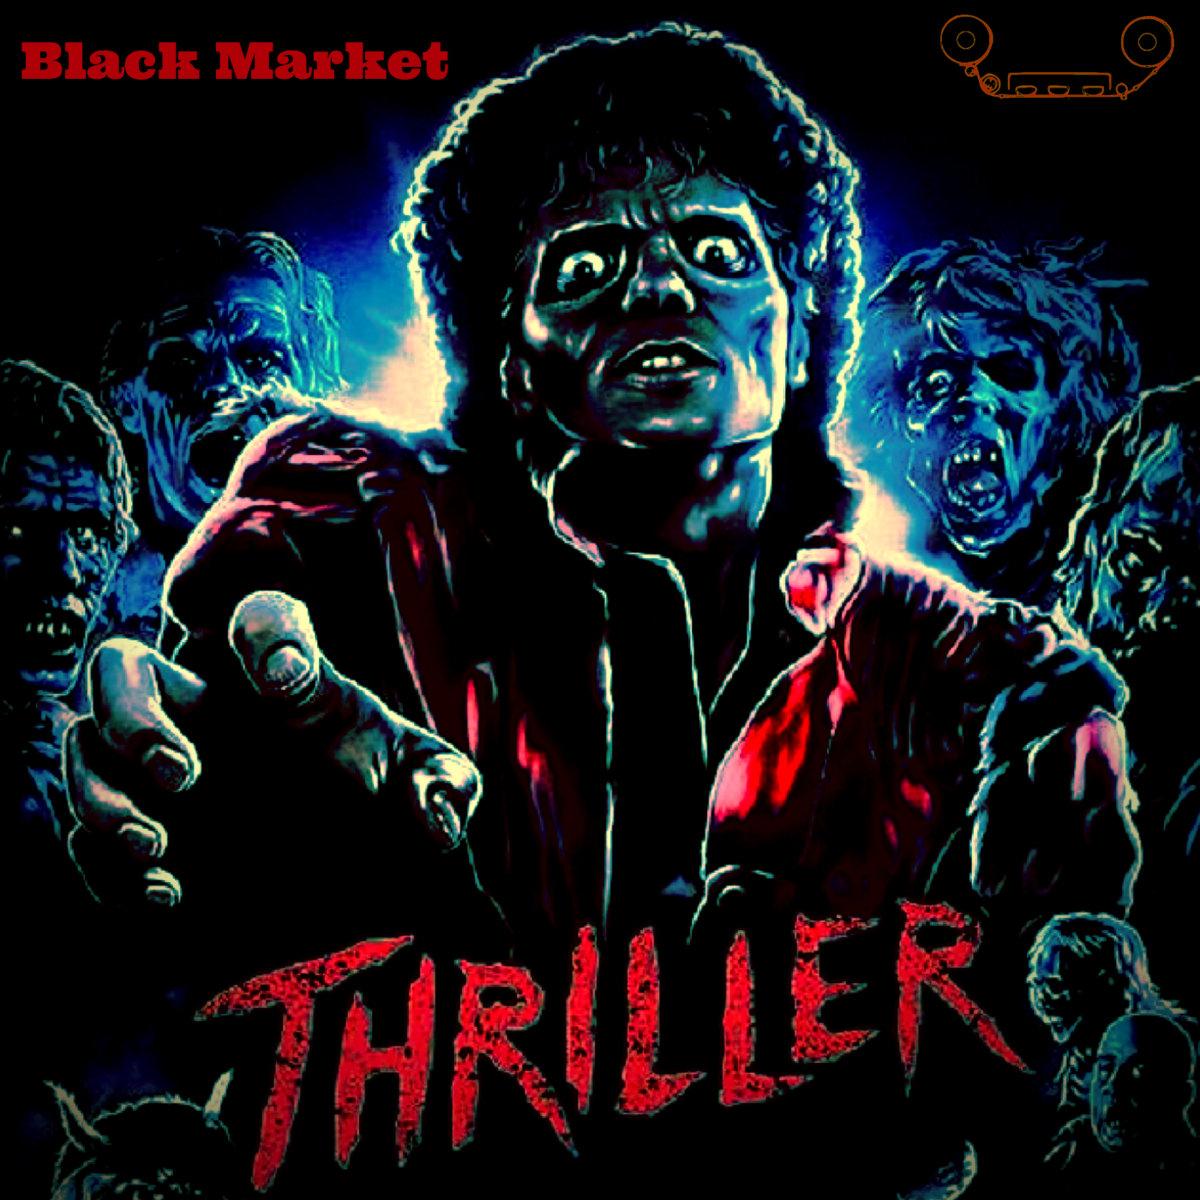 Michael Jackson - Thriller | Black Market